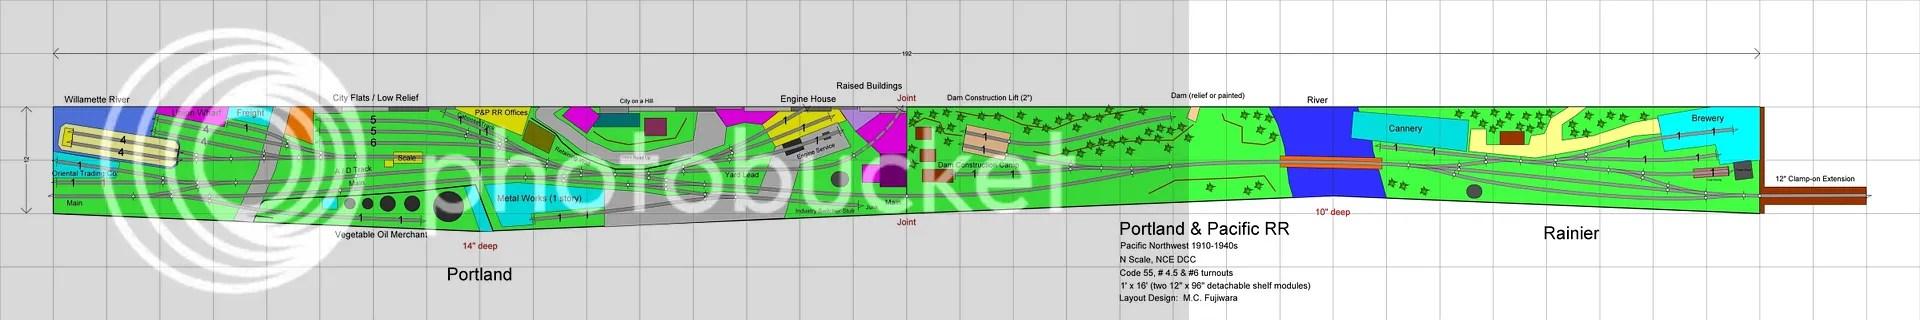 shelf railroad track plans | rightful73vke